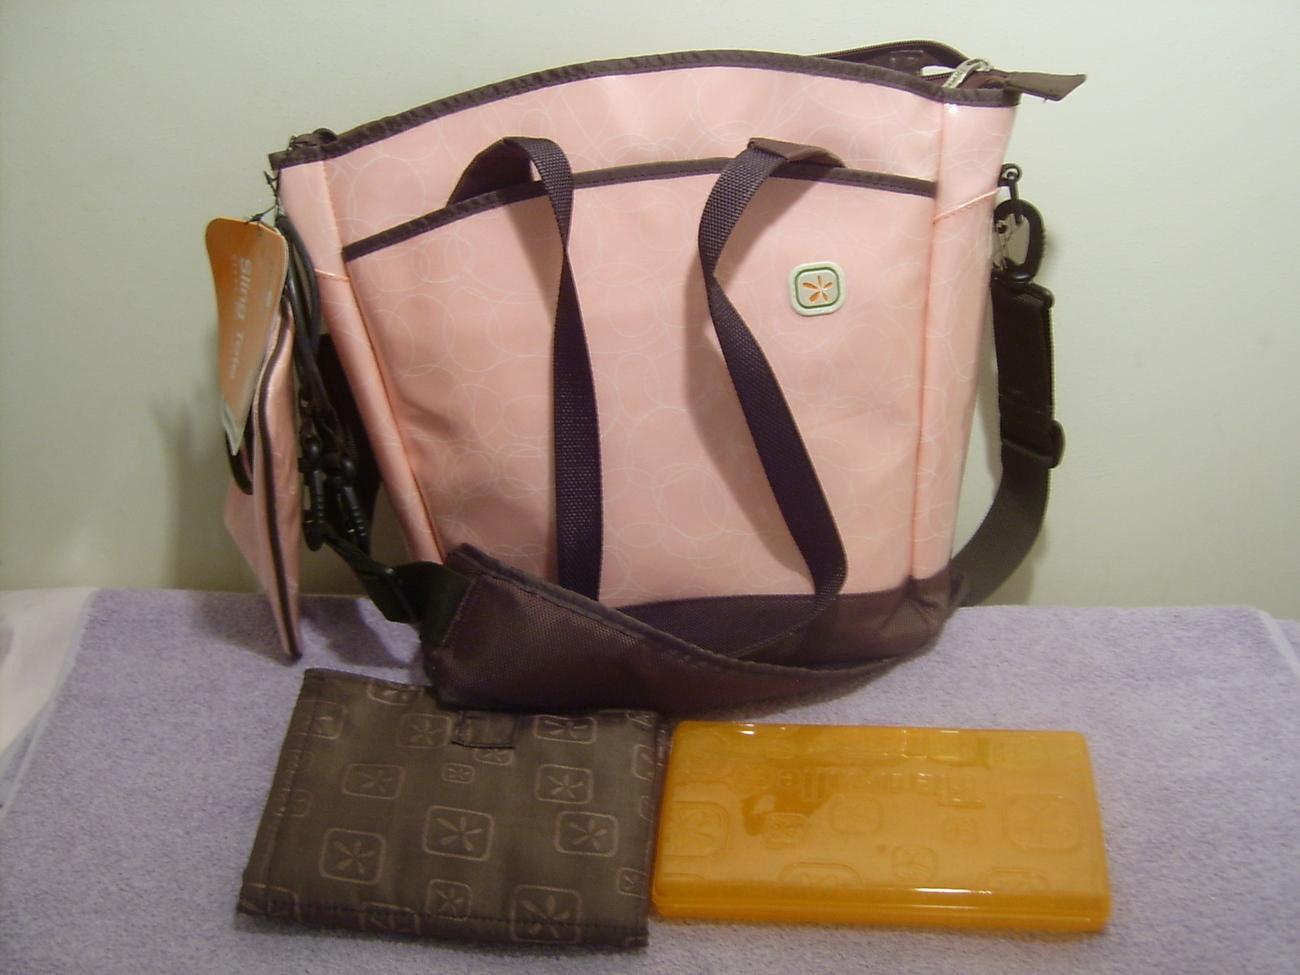 FLEURVILLE DIAPER BAG SLING TOTE PINK NEW Bonanza